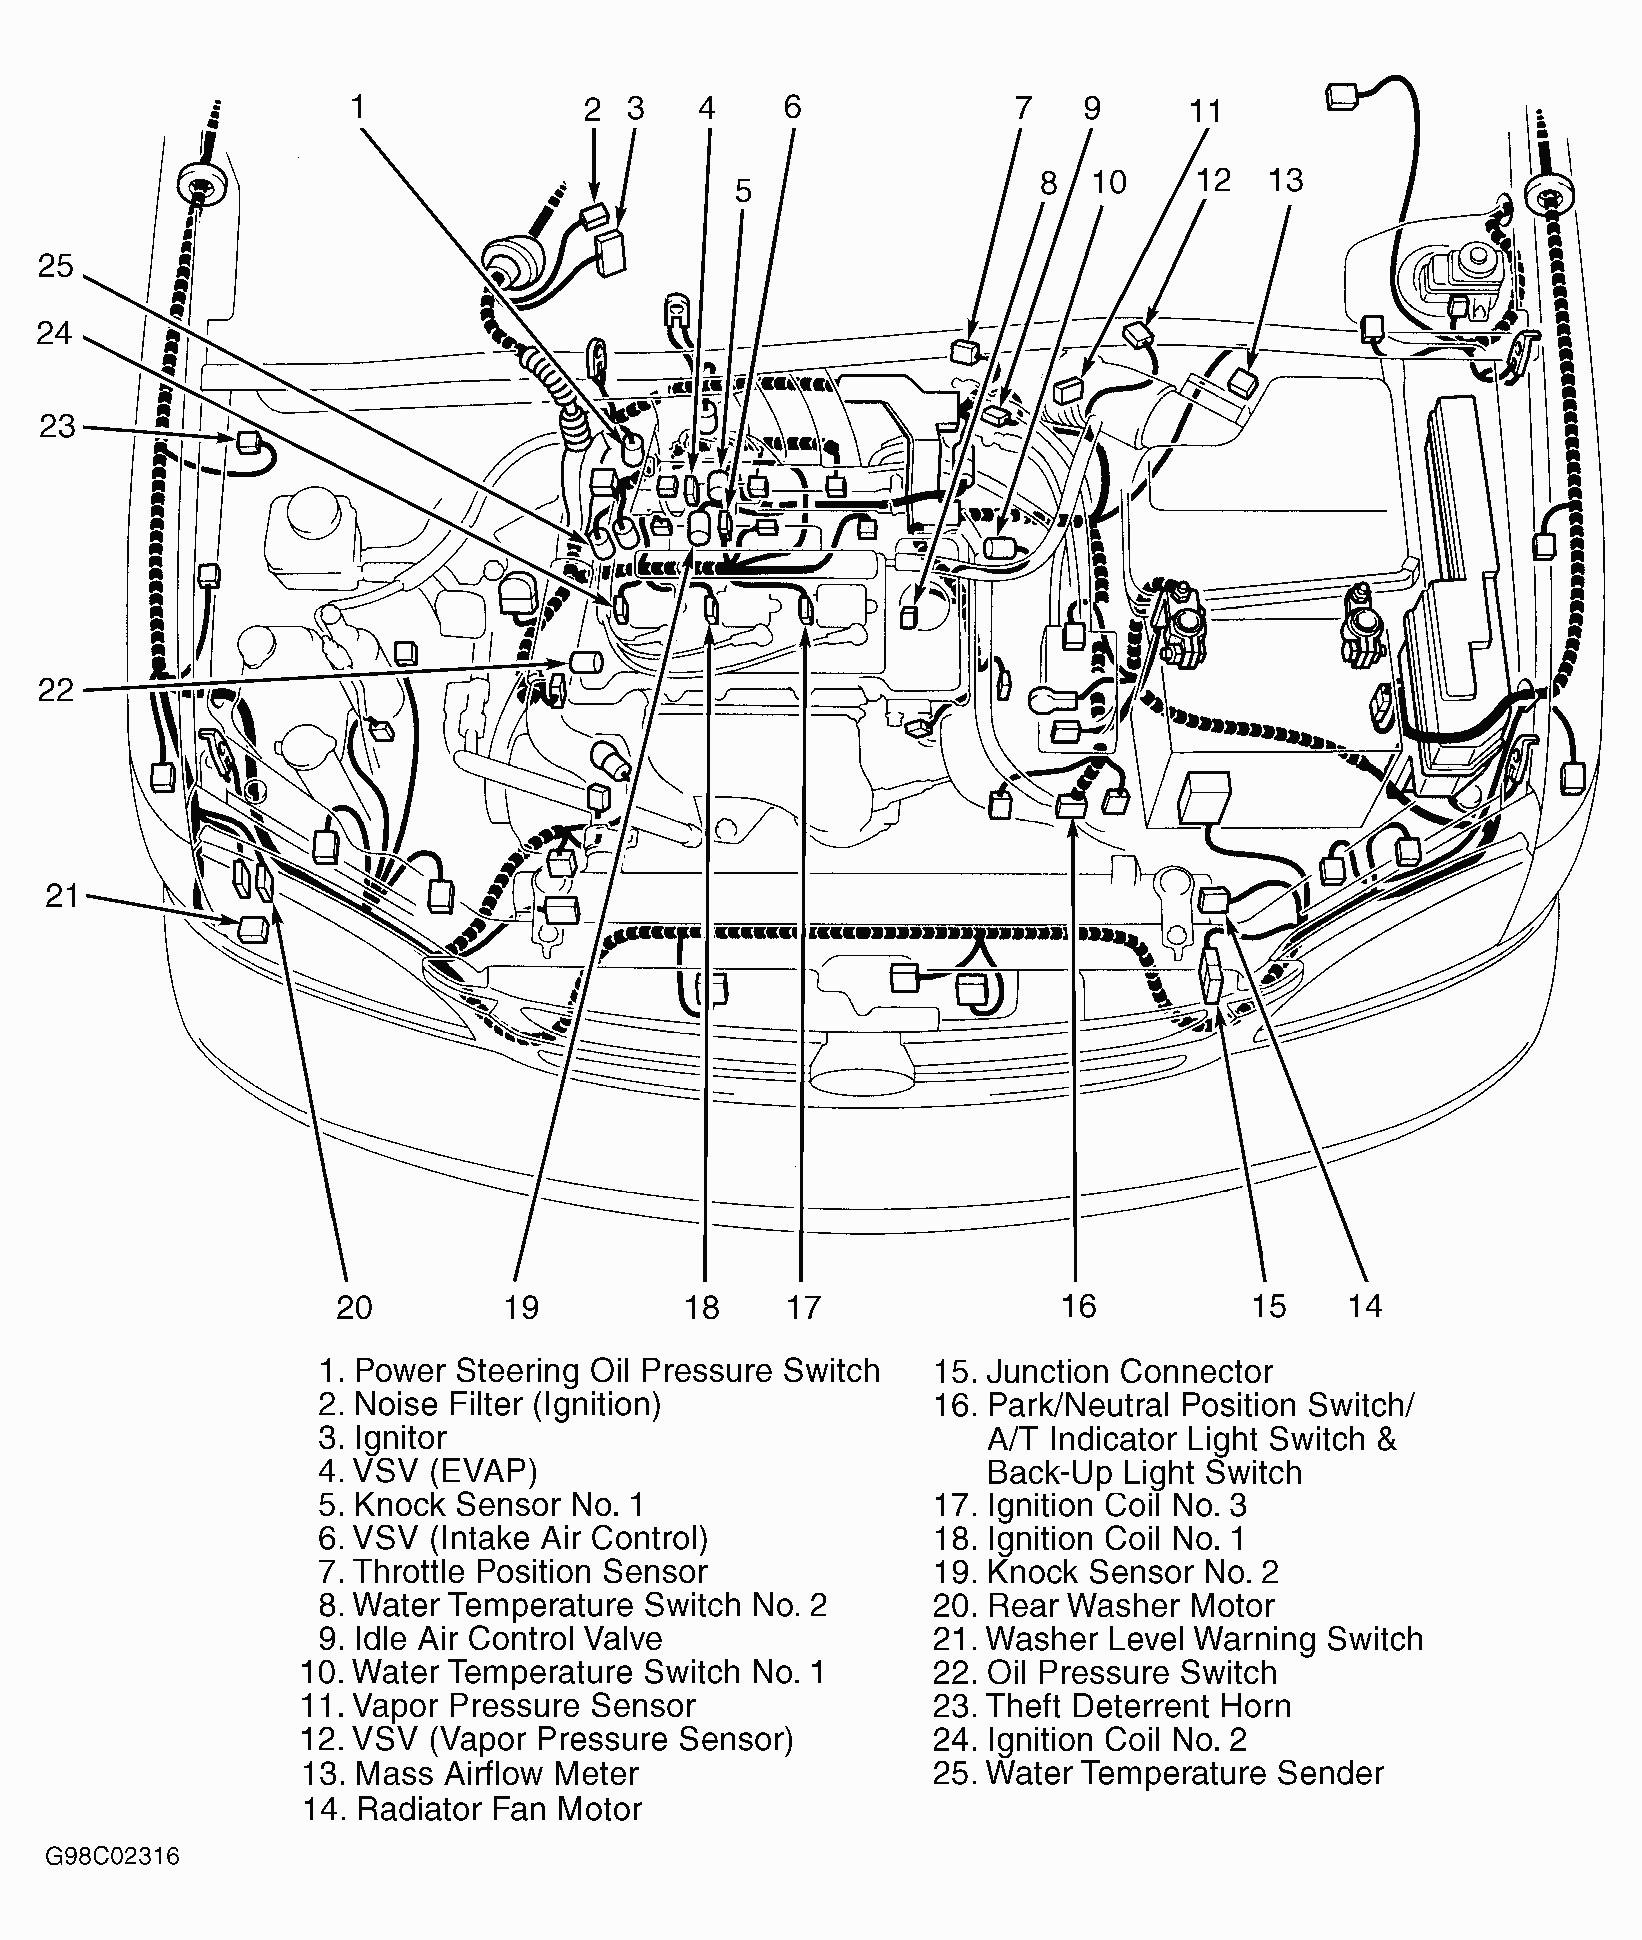 2002 toyota echo engine diagram wiring diagram specialties